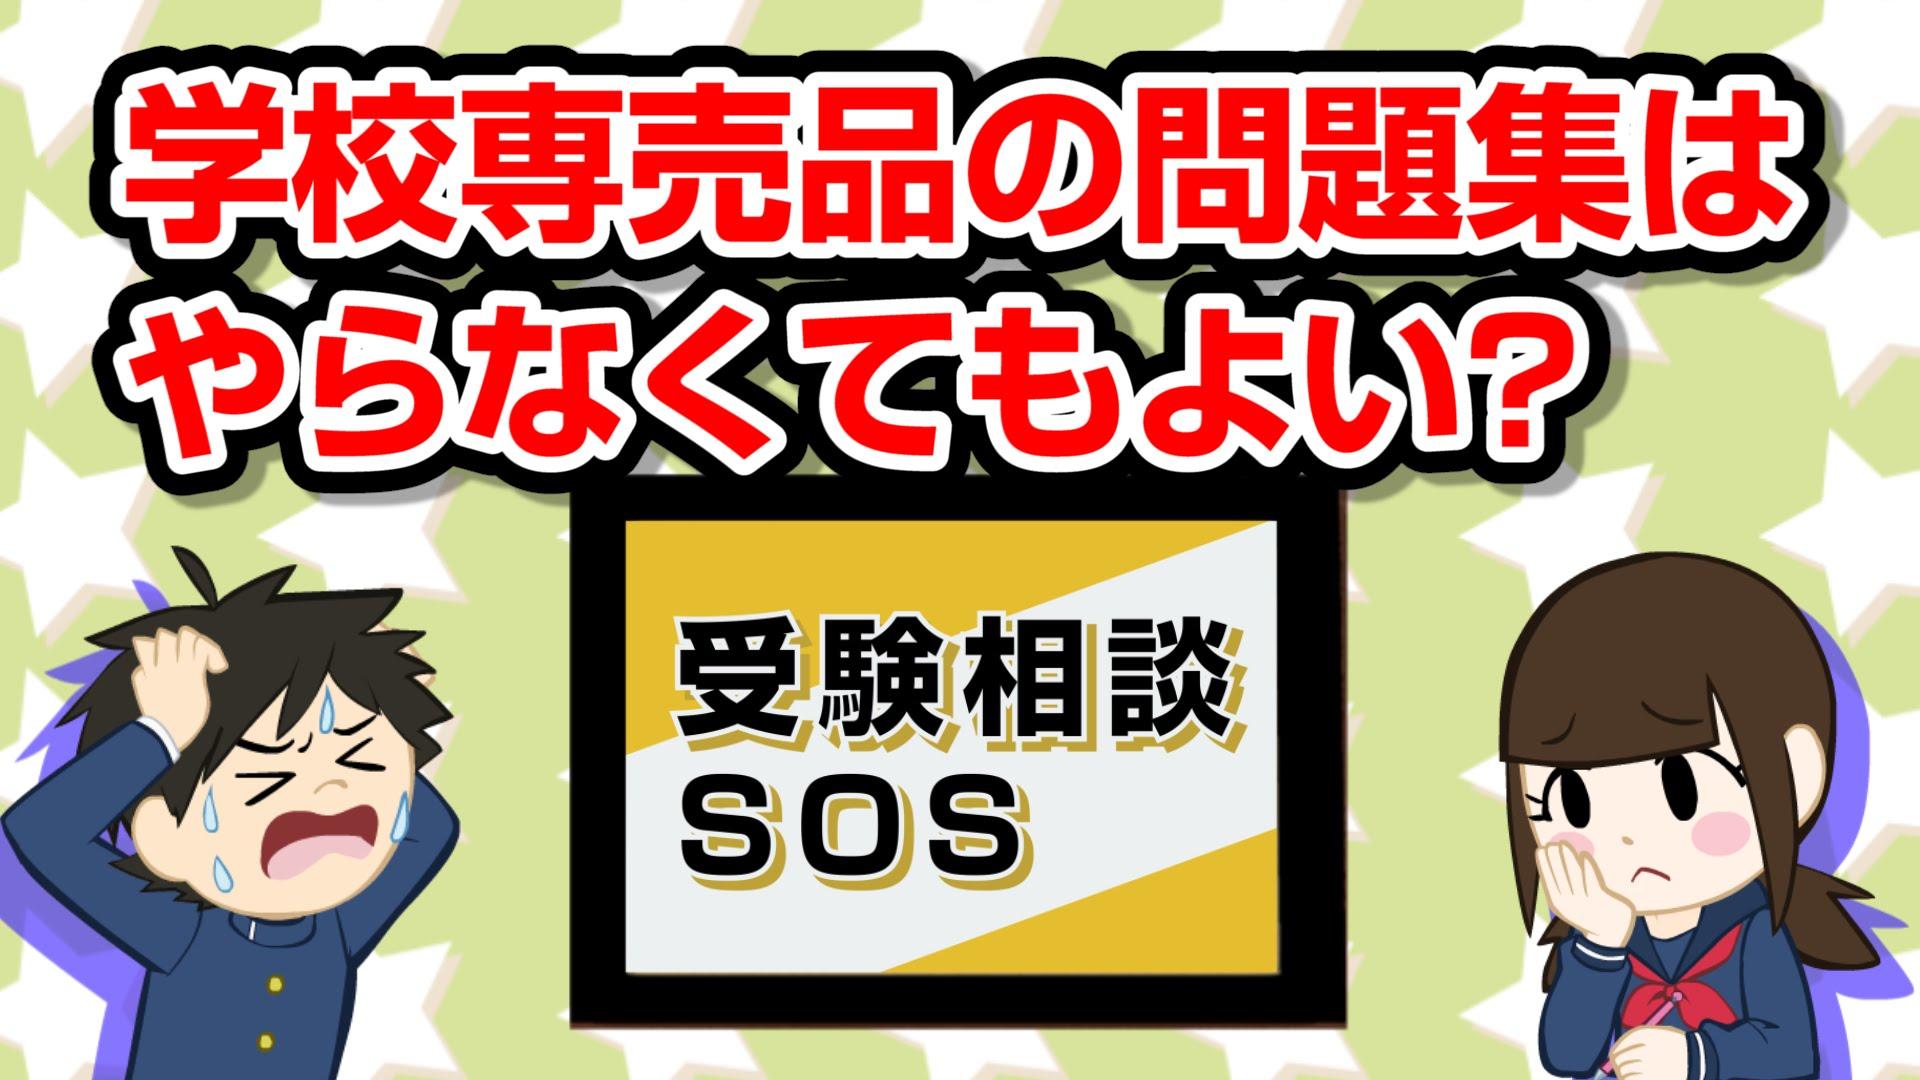 【vol.527】学校専売品の問題集はやらなくてもよい? うまく活用すべき?? 受験相談SOS